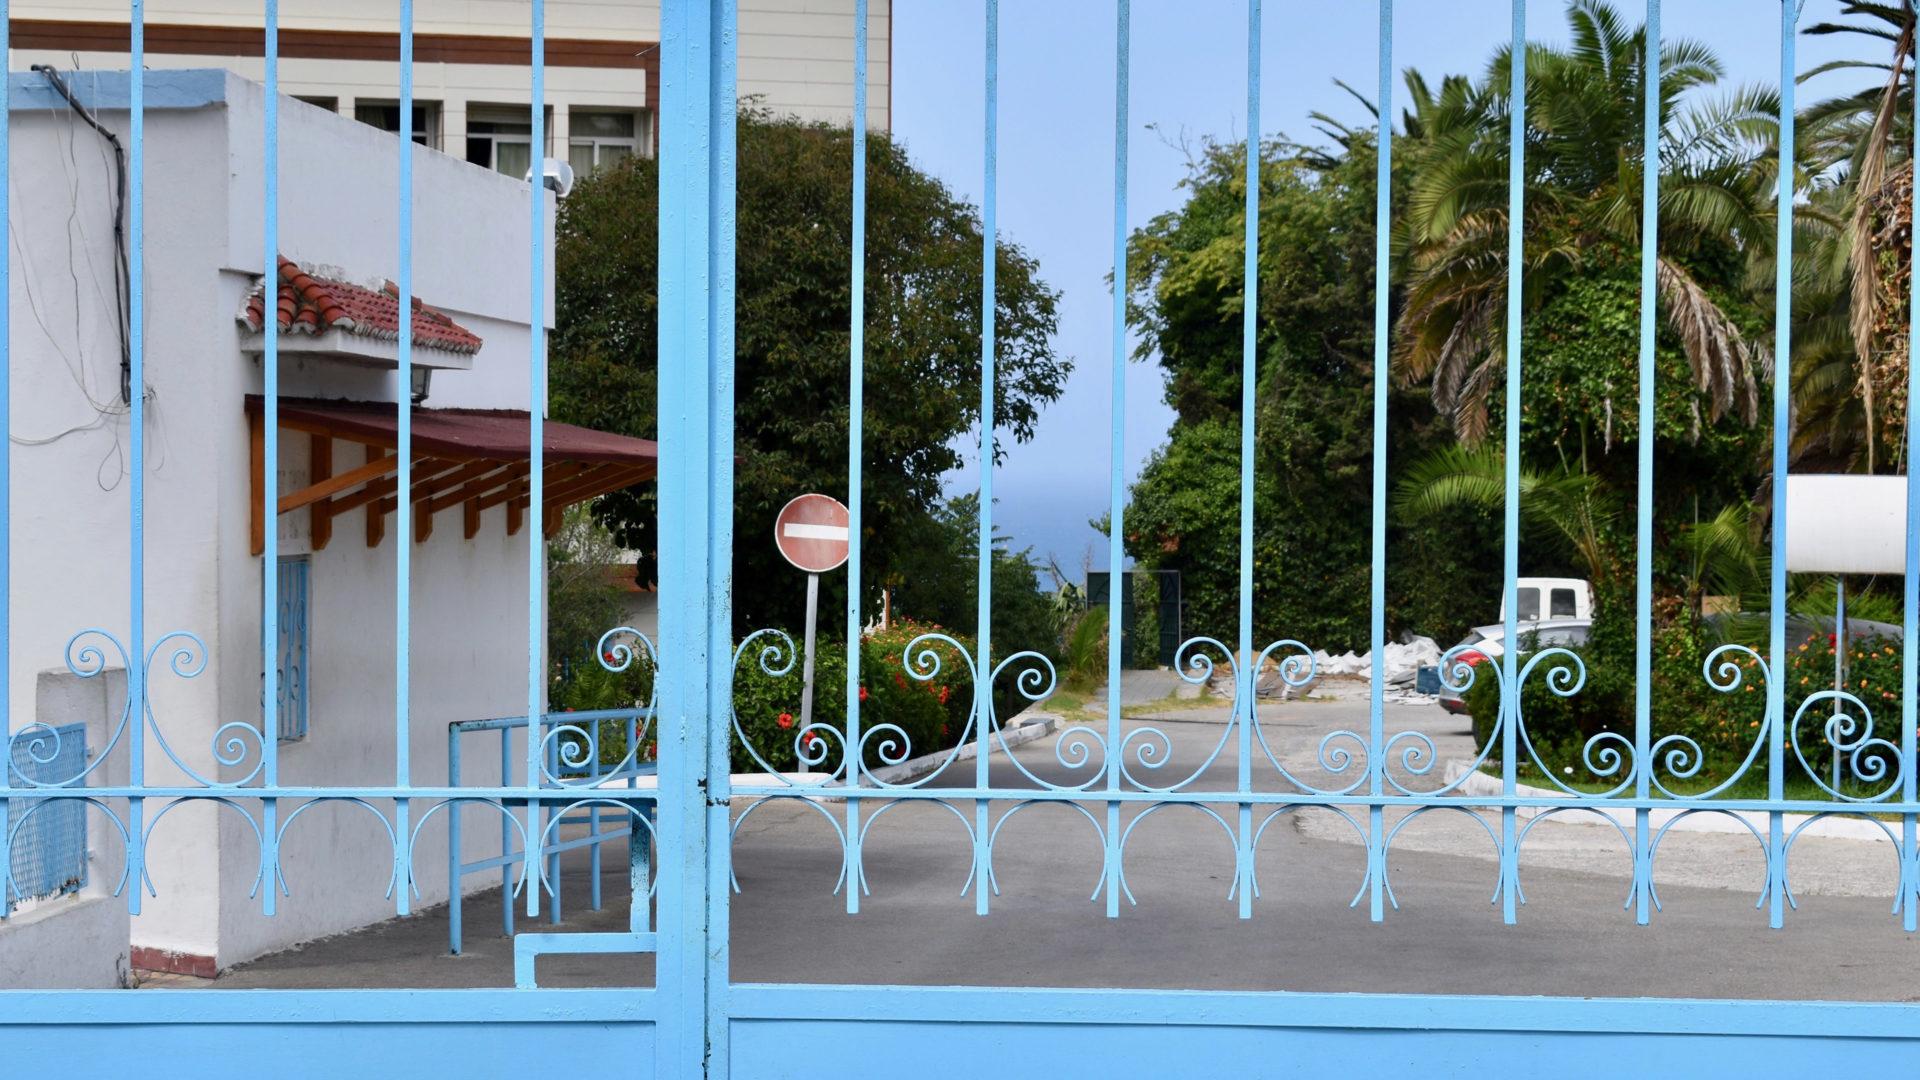 Outside the gates of Hopital Kortobi